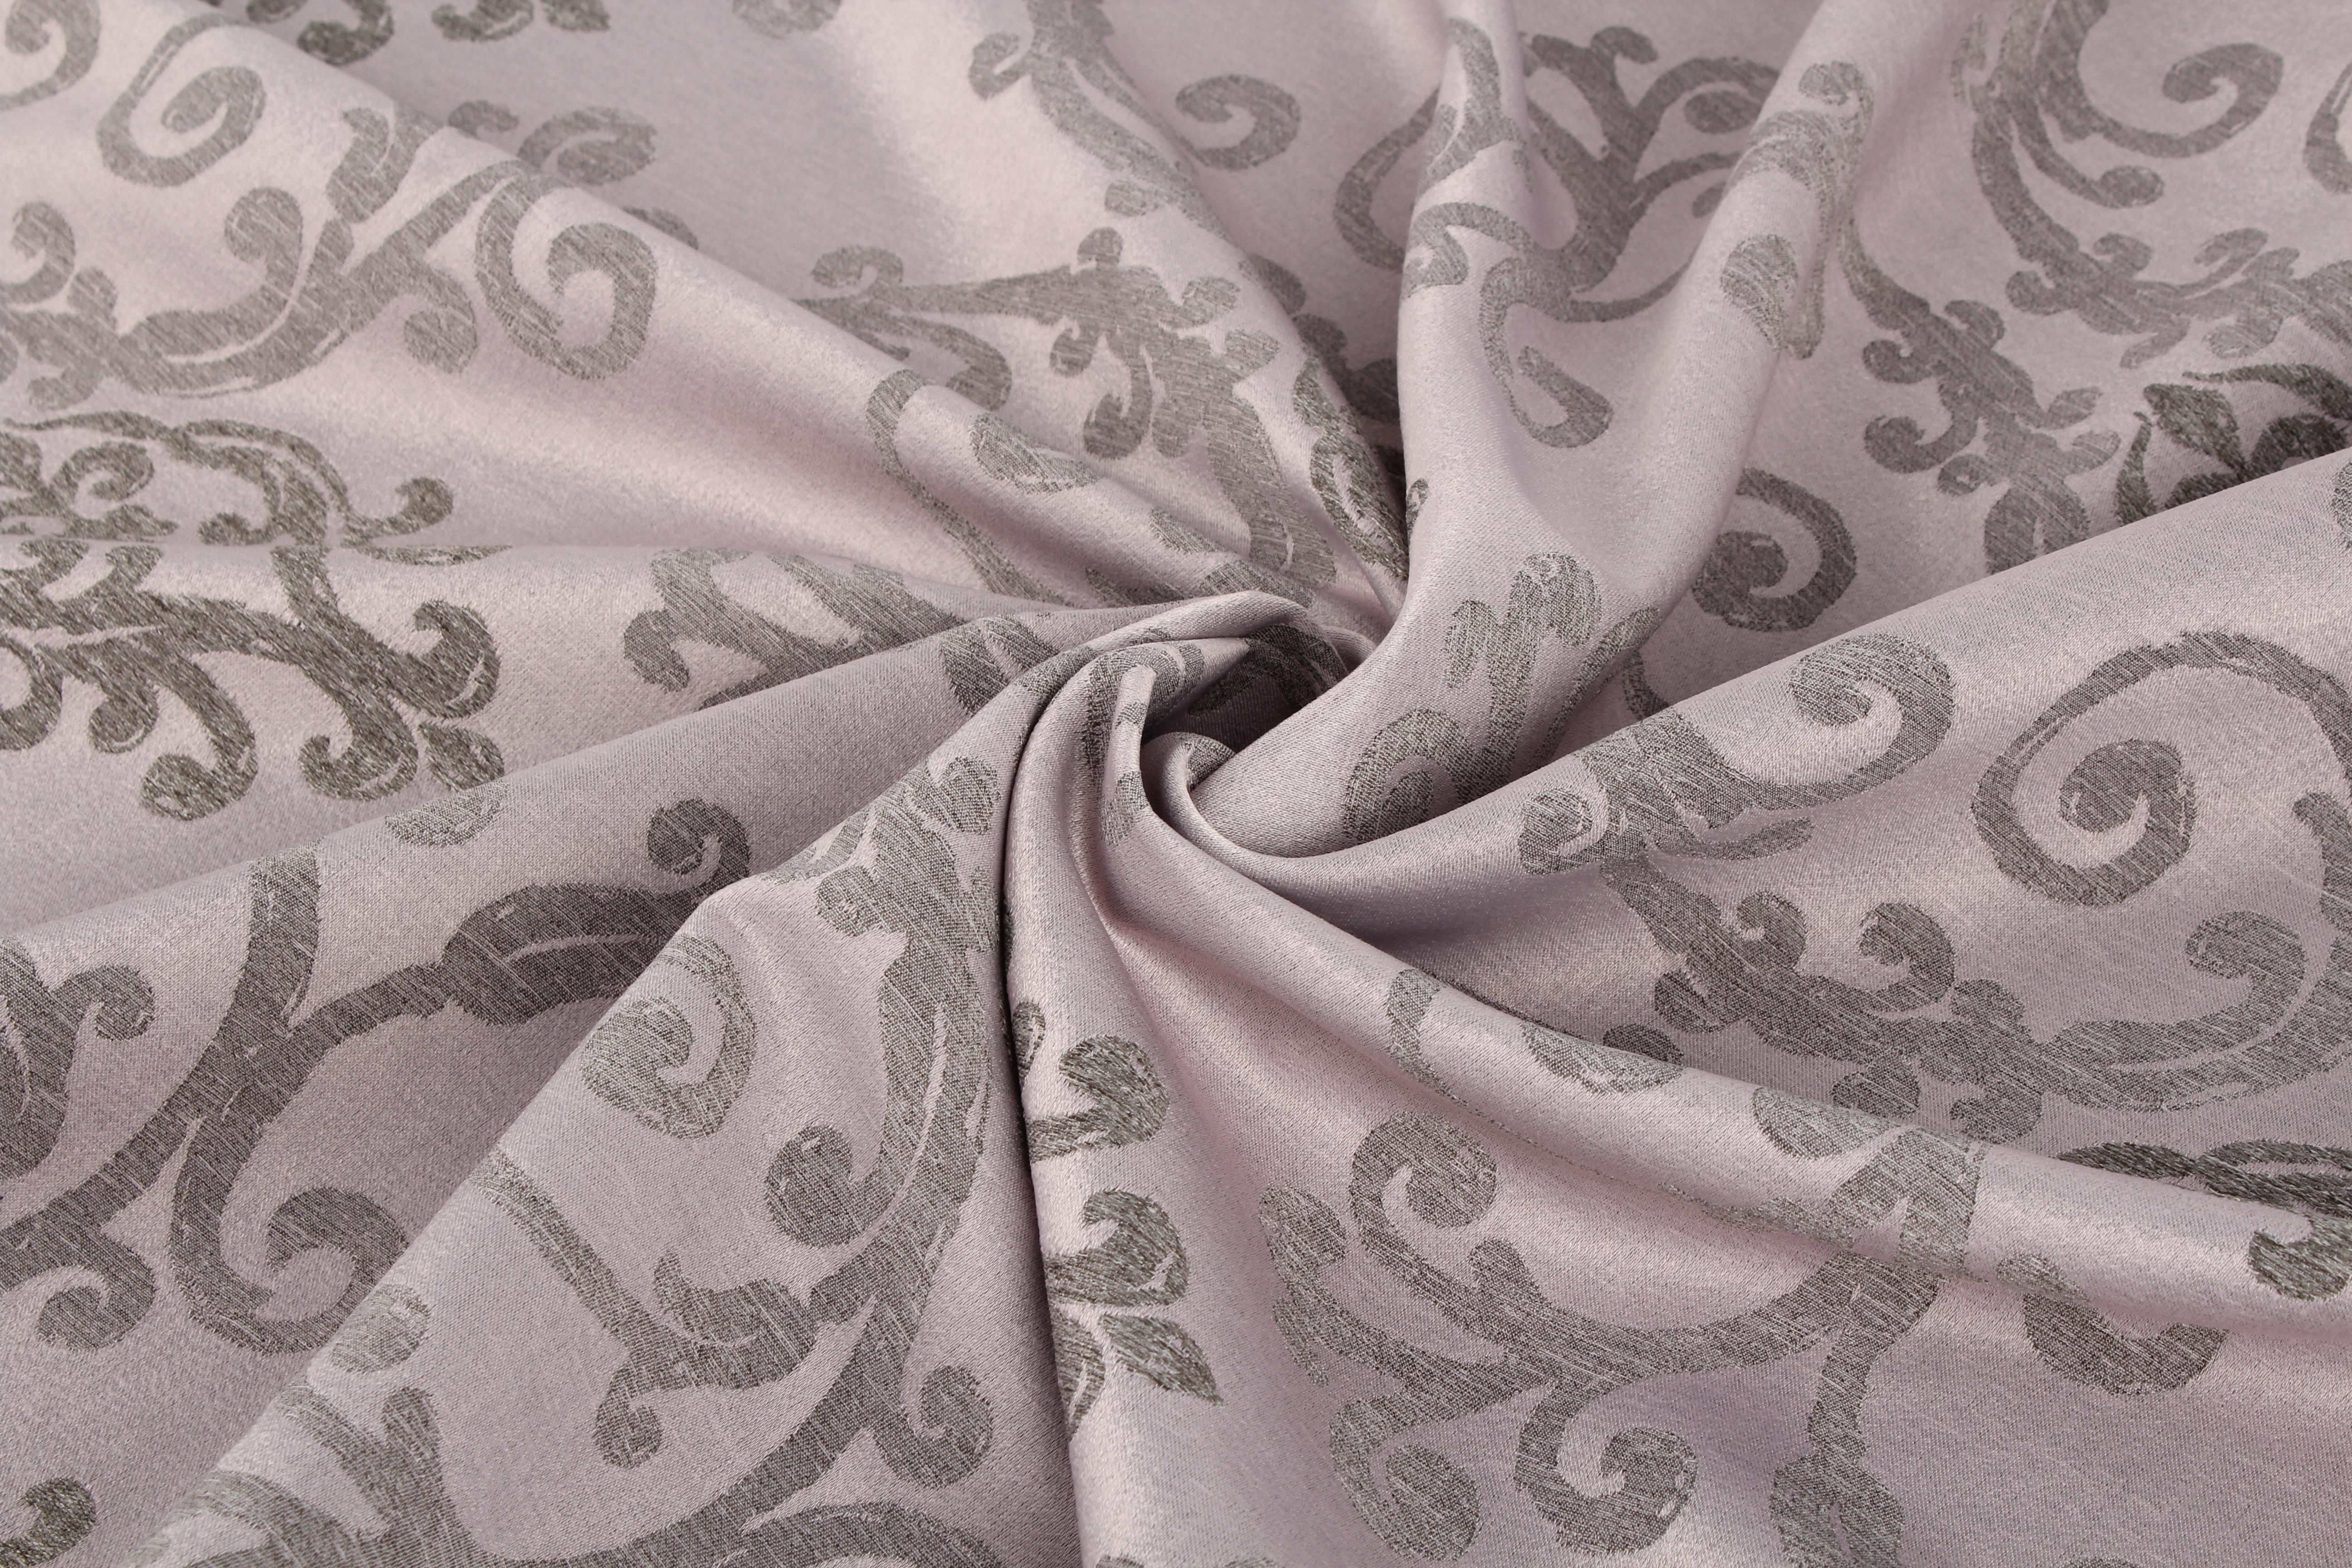 Купить Ткани TexRepublic, Материал Жаккард Provence Цвет: Сиреневый, Турция